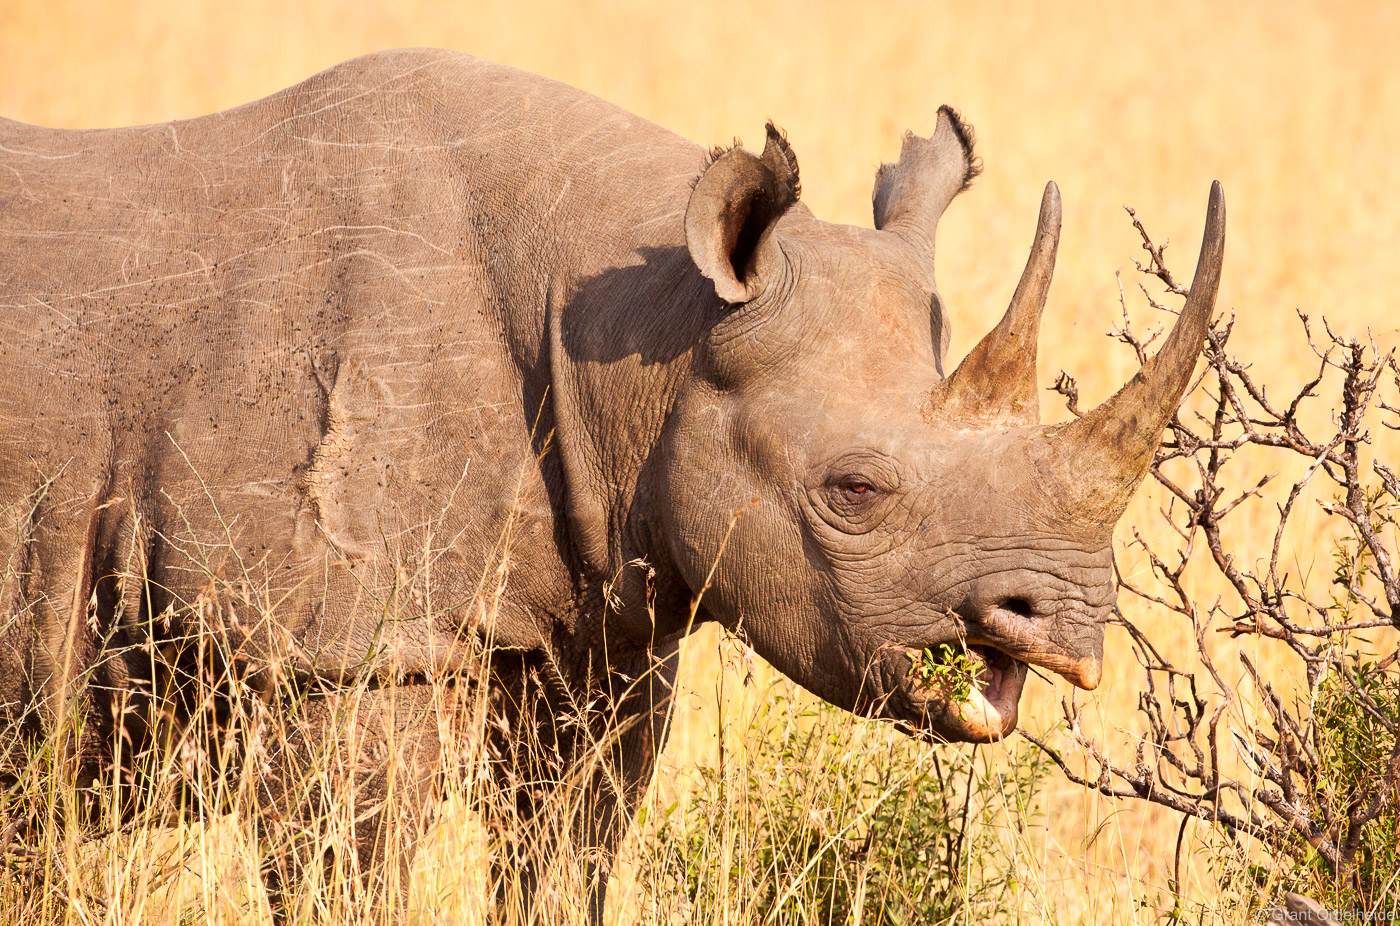 A rare black horned rhino in Kenya's Masai Mara.